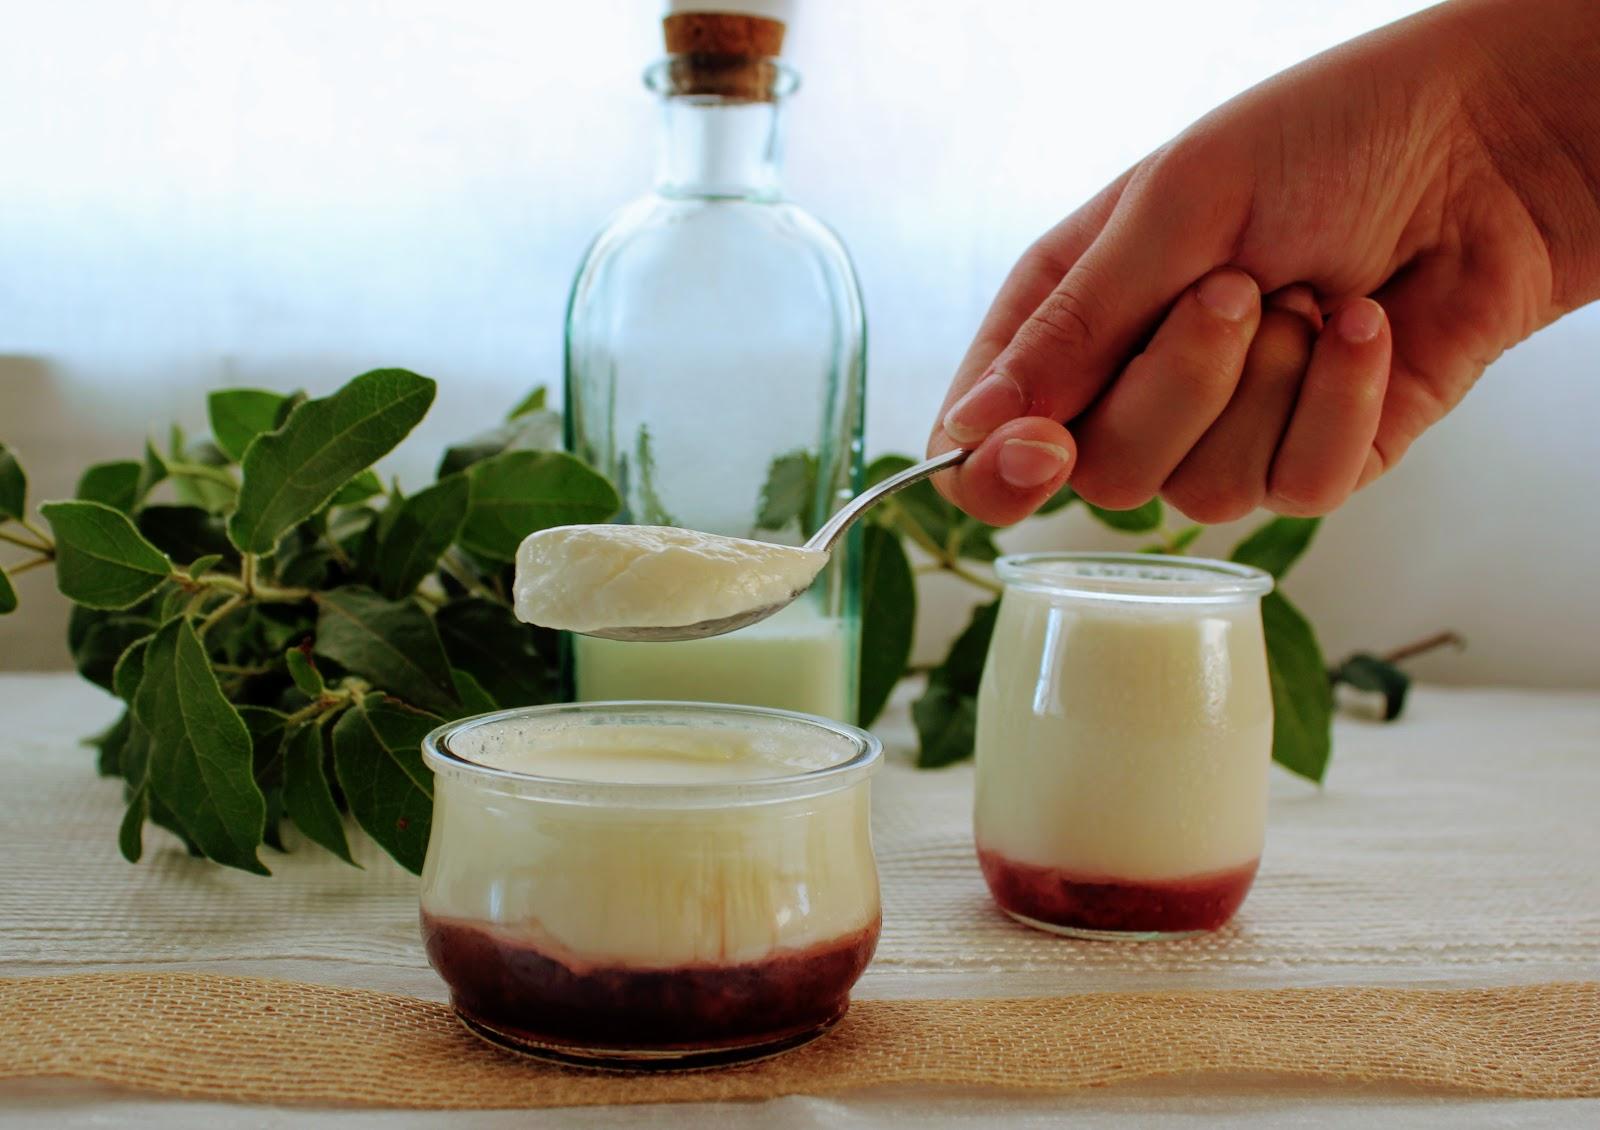 Lactosa la leche de soja